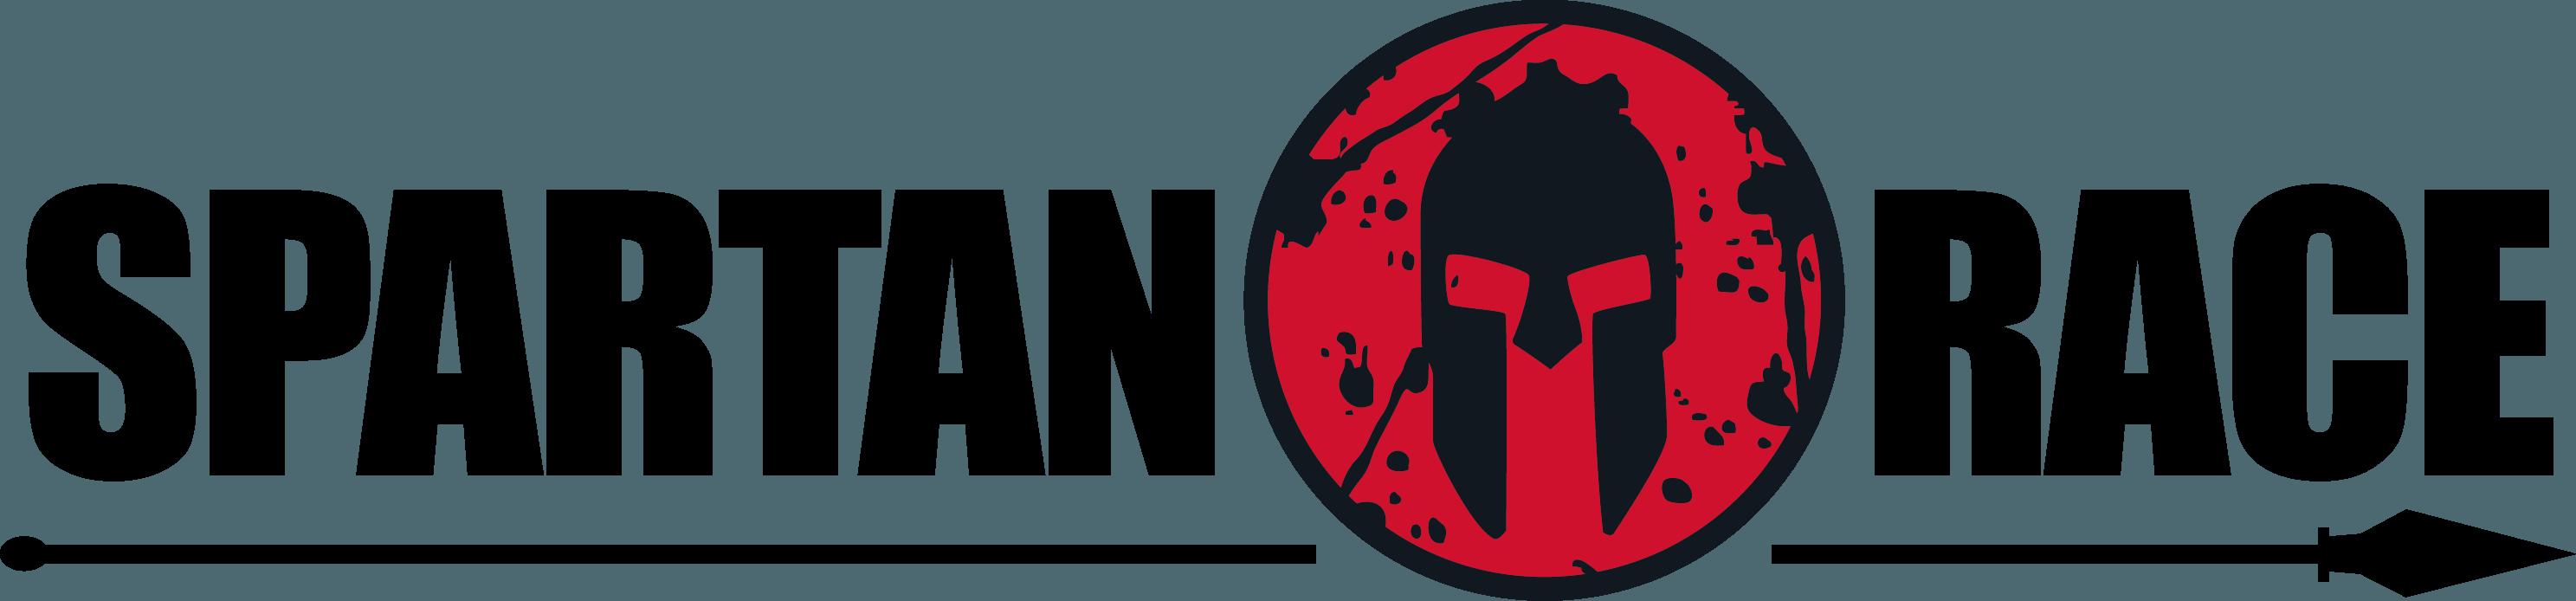 Spartan Race Logo png